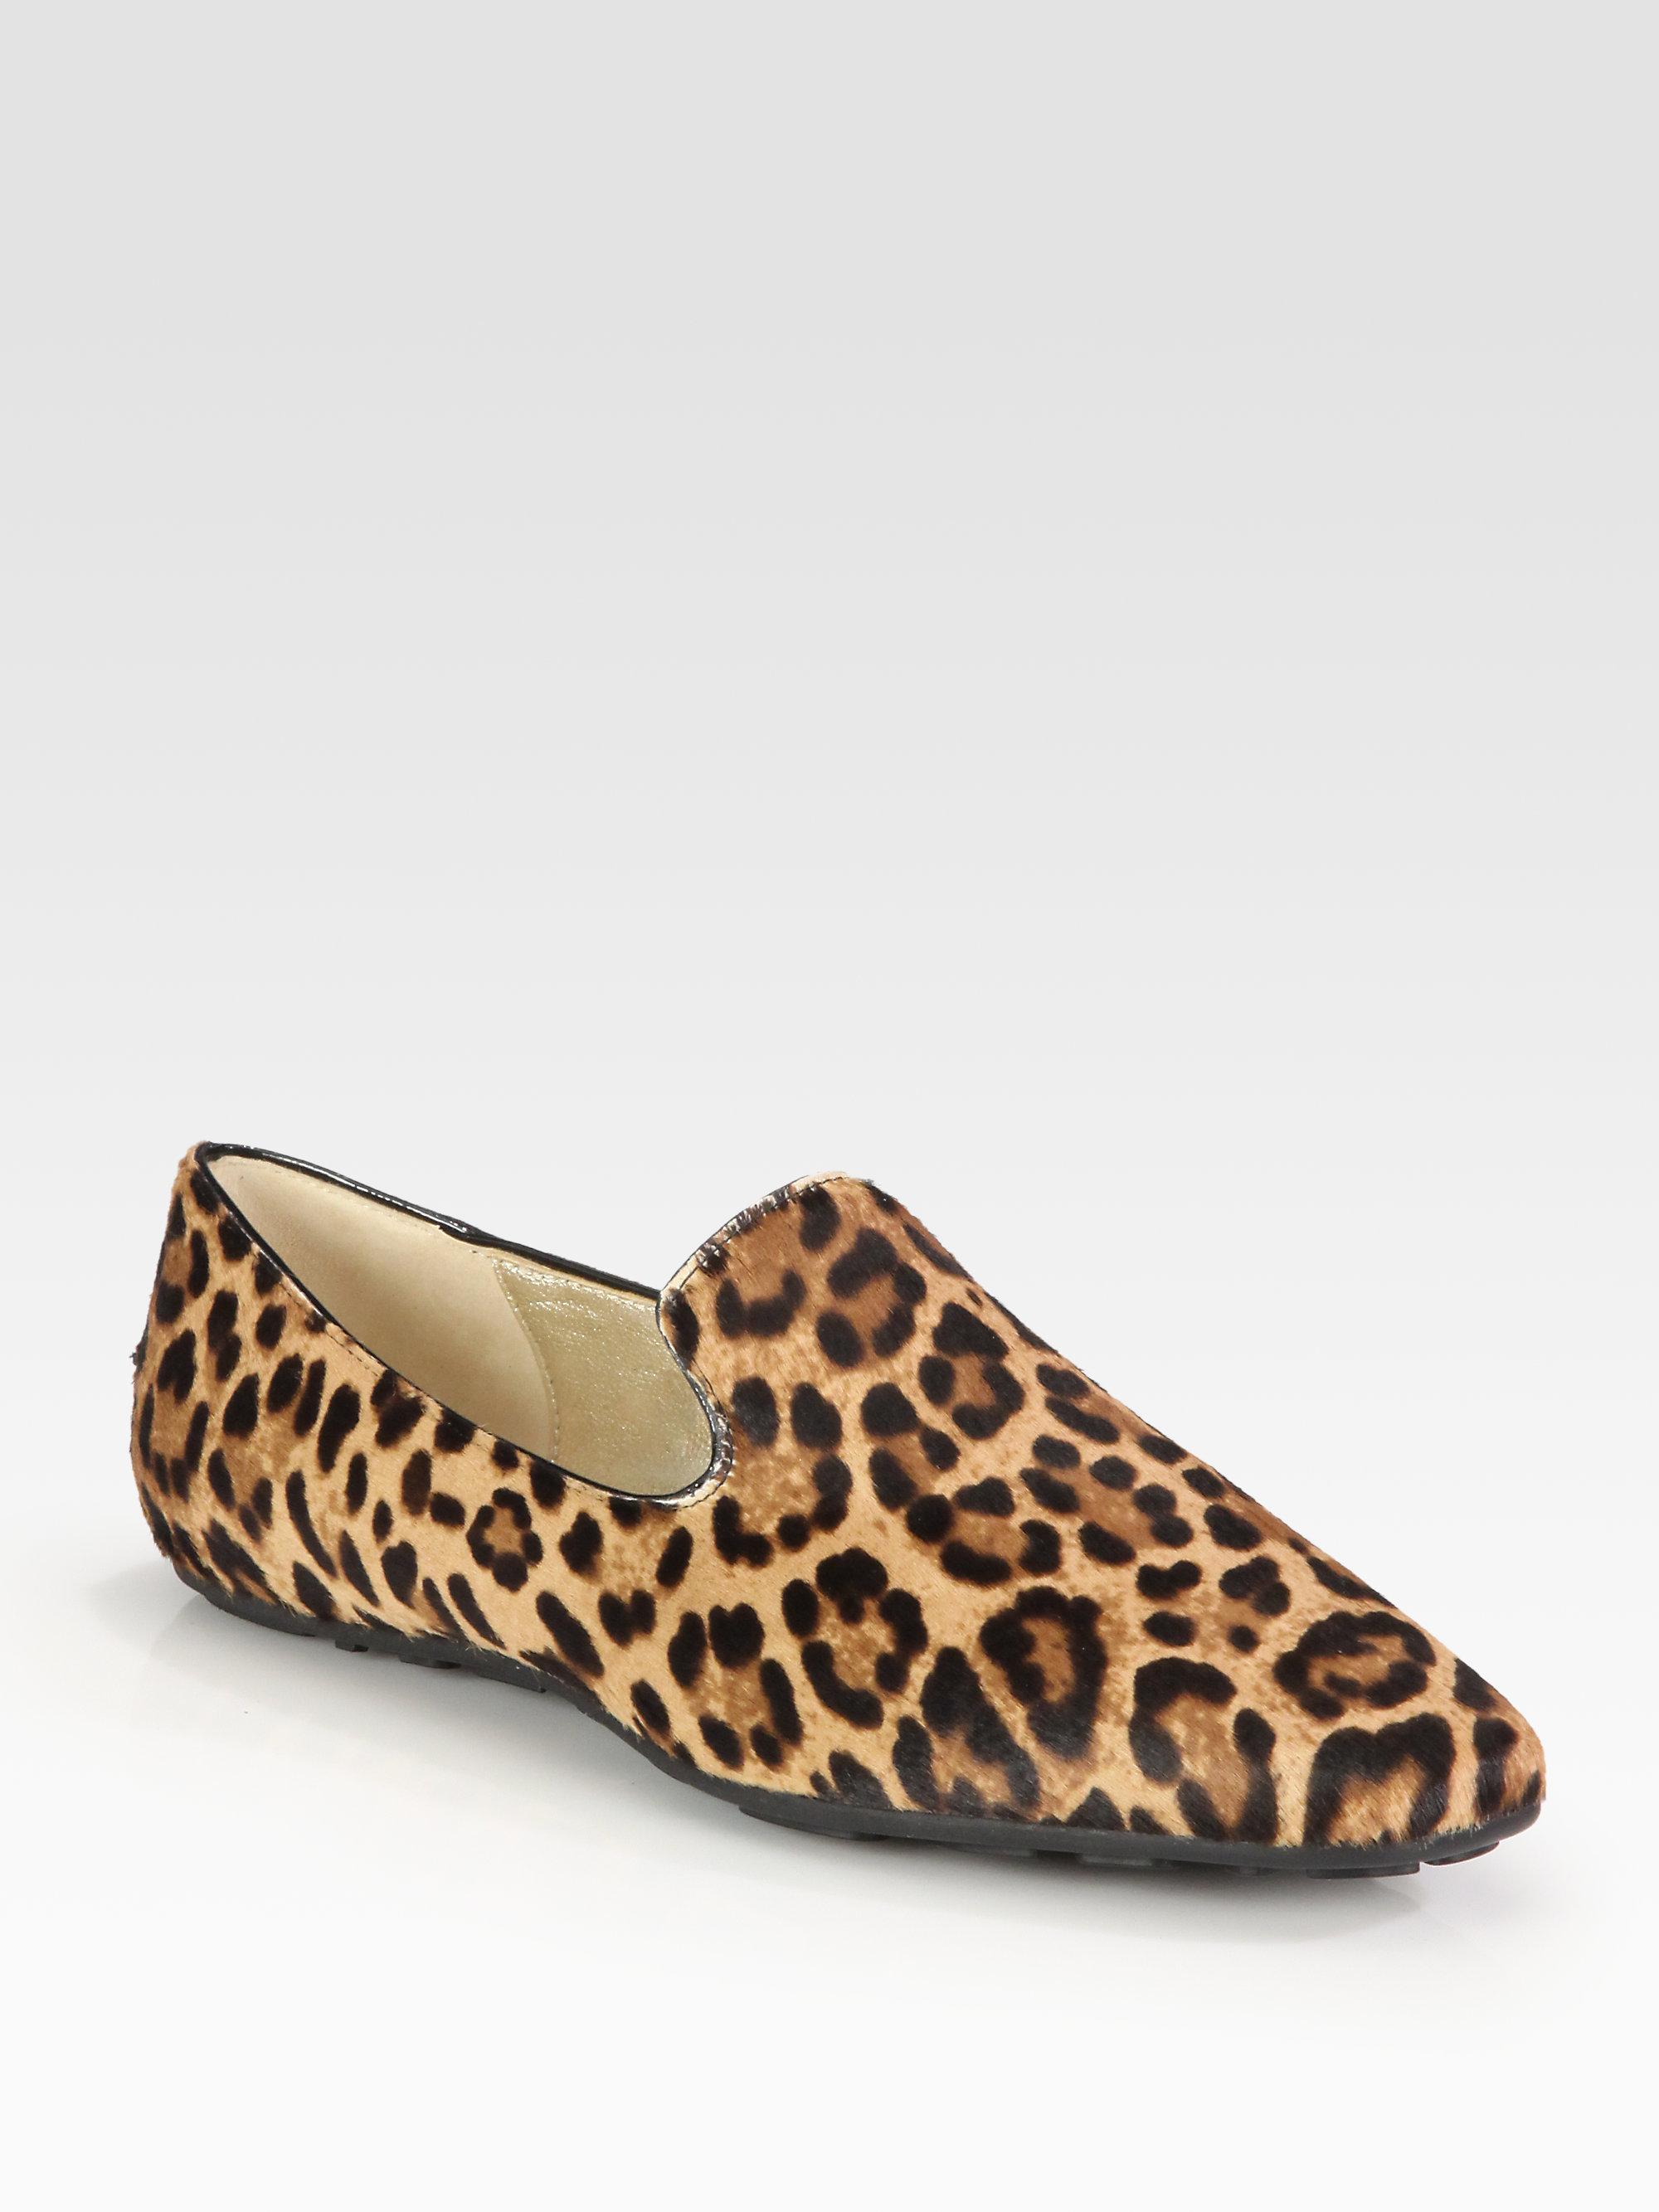 Jimmy Choo Leopard Ponyhair Loafers cheap sale visit sJUCEM